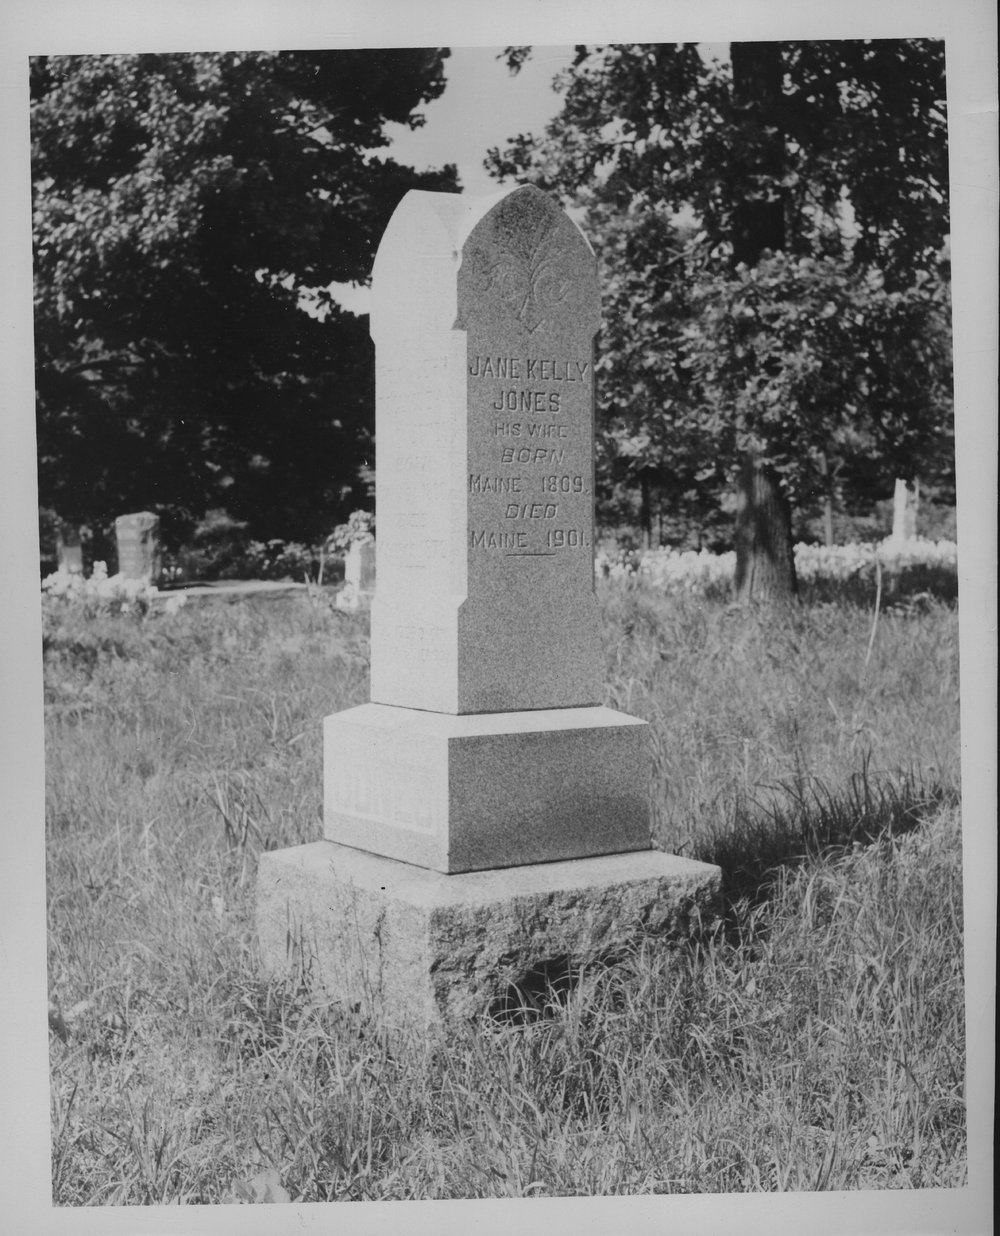 Rev. John Tecumseh Jones and Jane Kelly Jones gravesite - Photo #13 is of the monument marking the grave of Jane Kelly Jones, wife of John Tecumseh Jones.